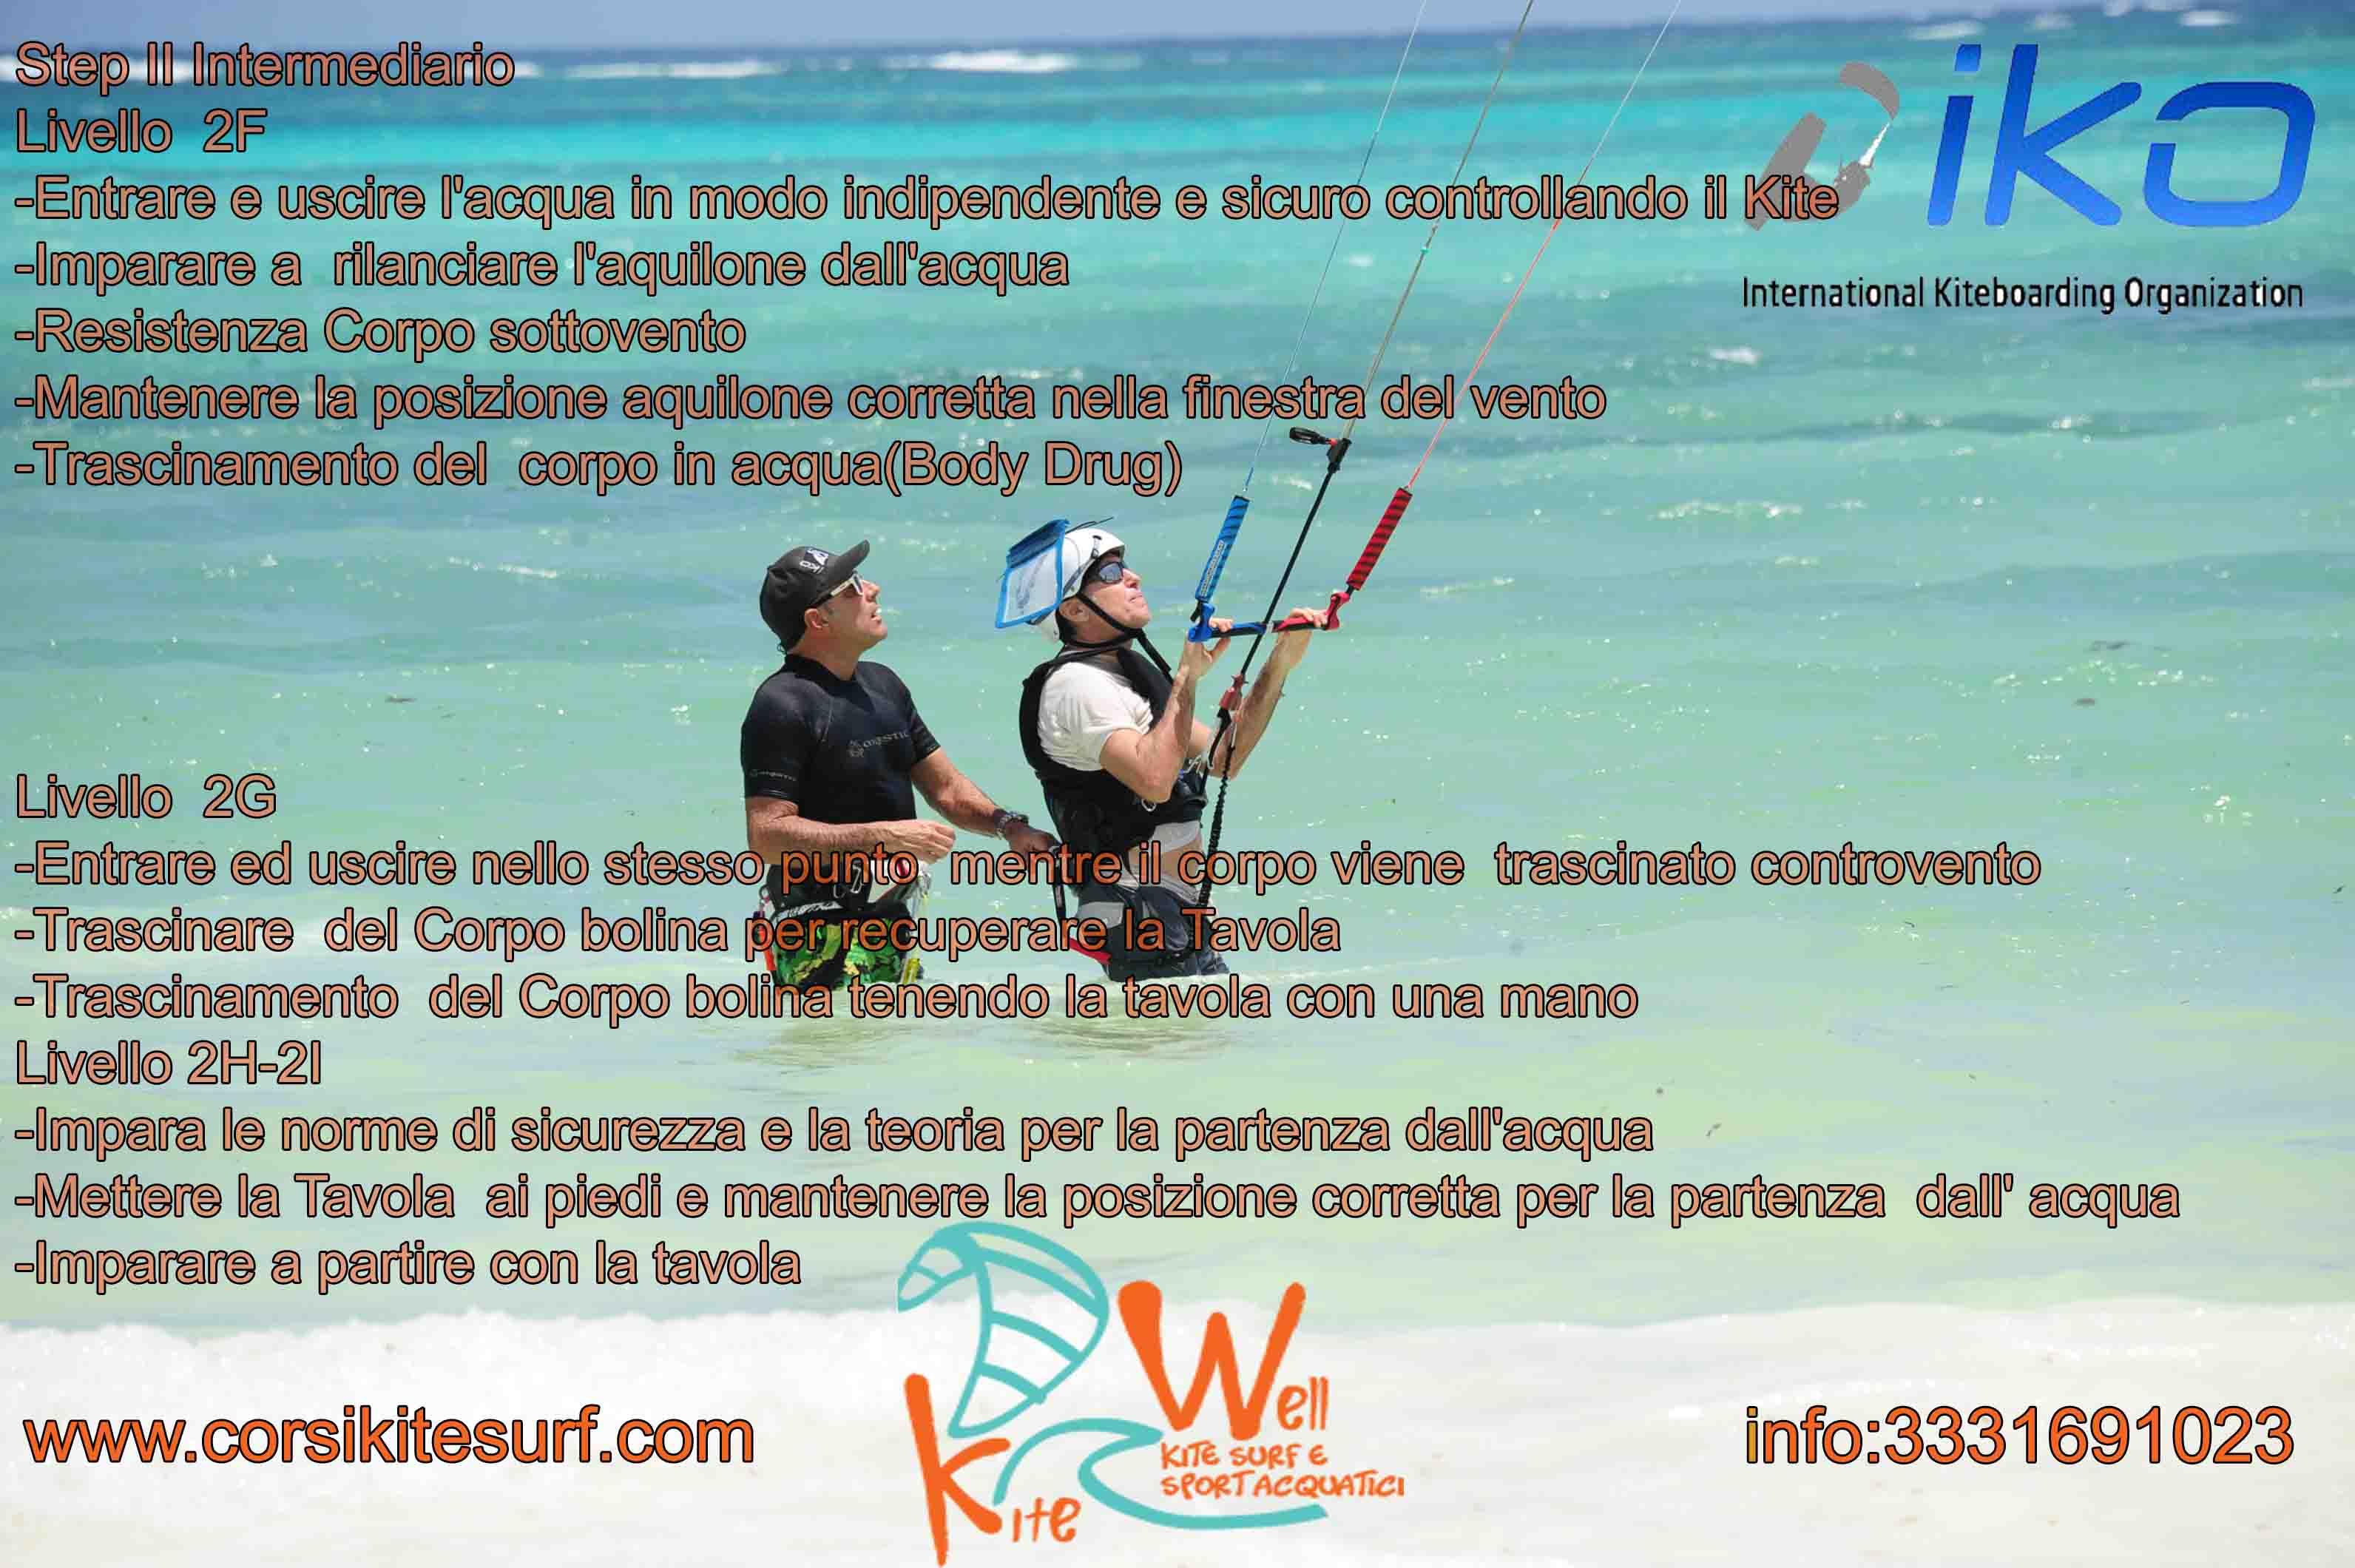 iko-corso-toscana-pasuqa-2015-kitesurf-stepii-intermediaro-internationa-kitesurfing-organization